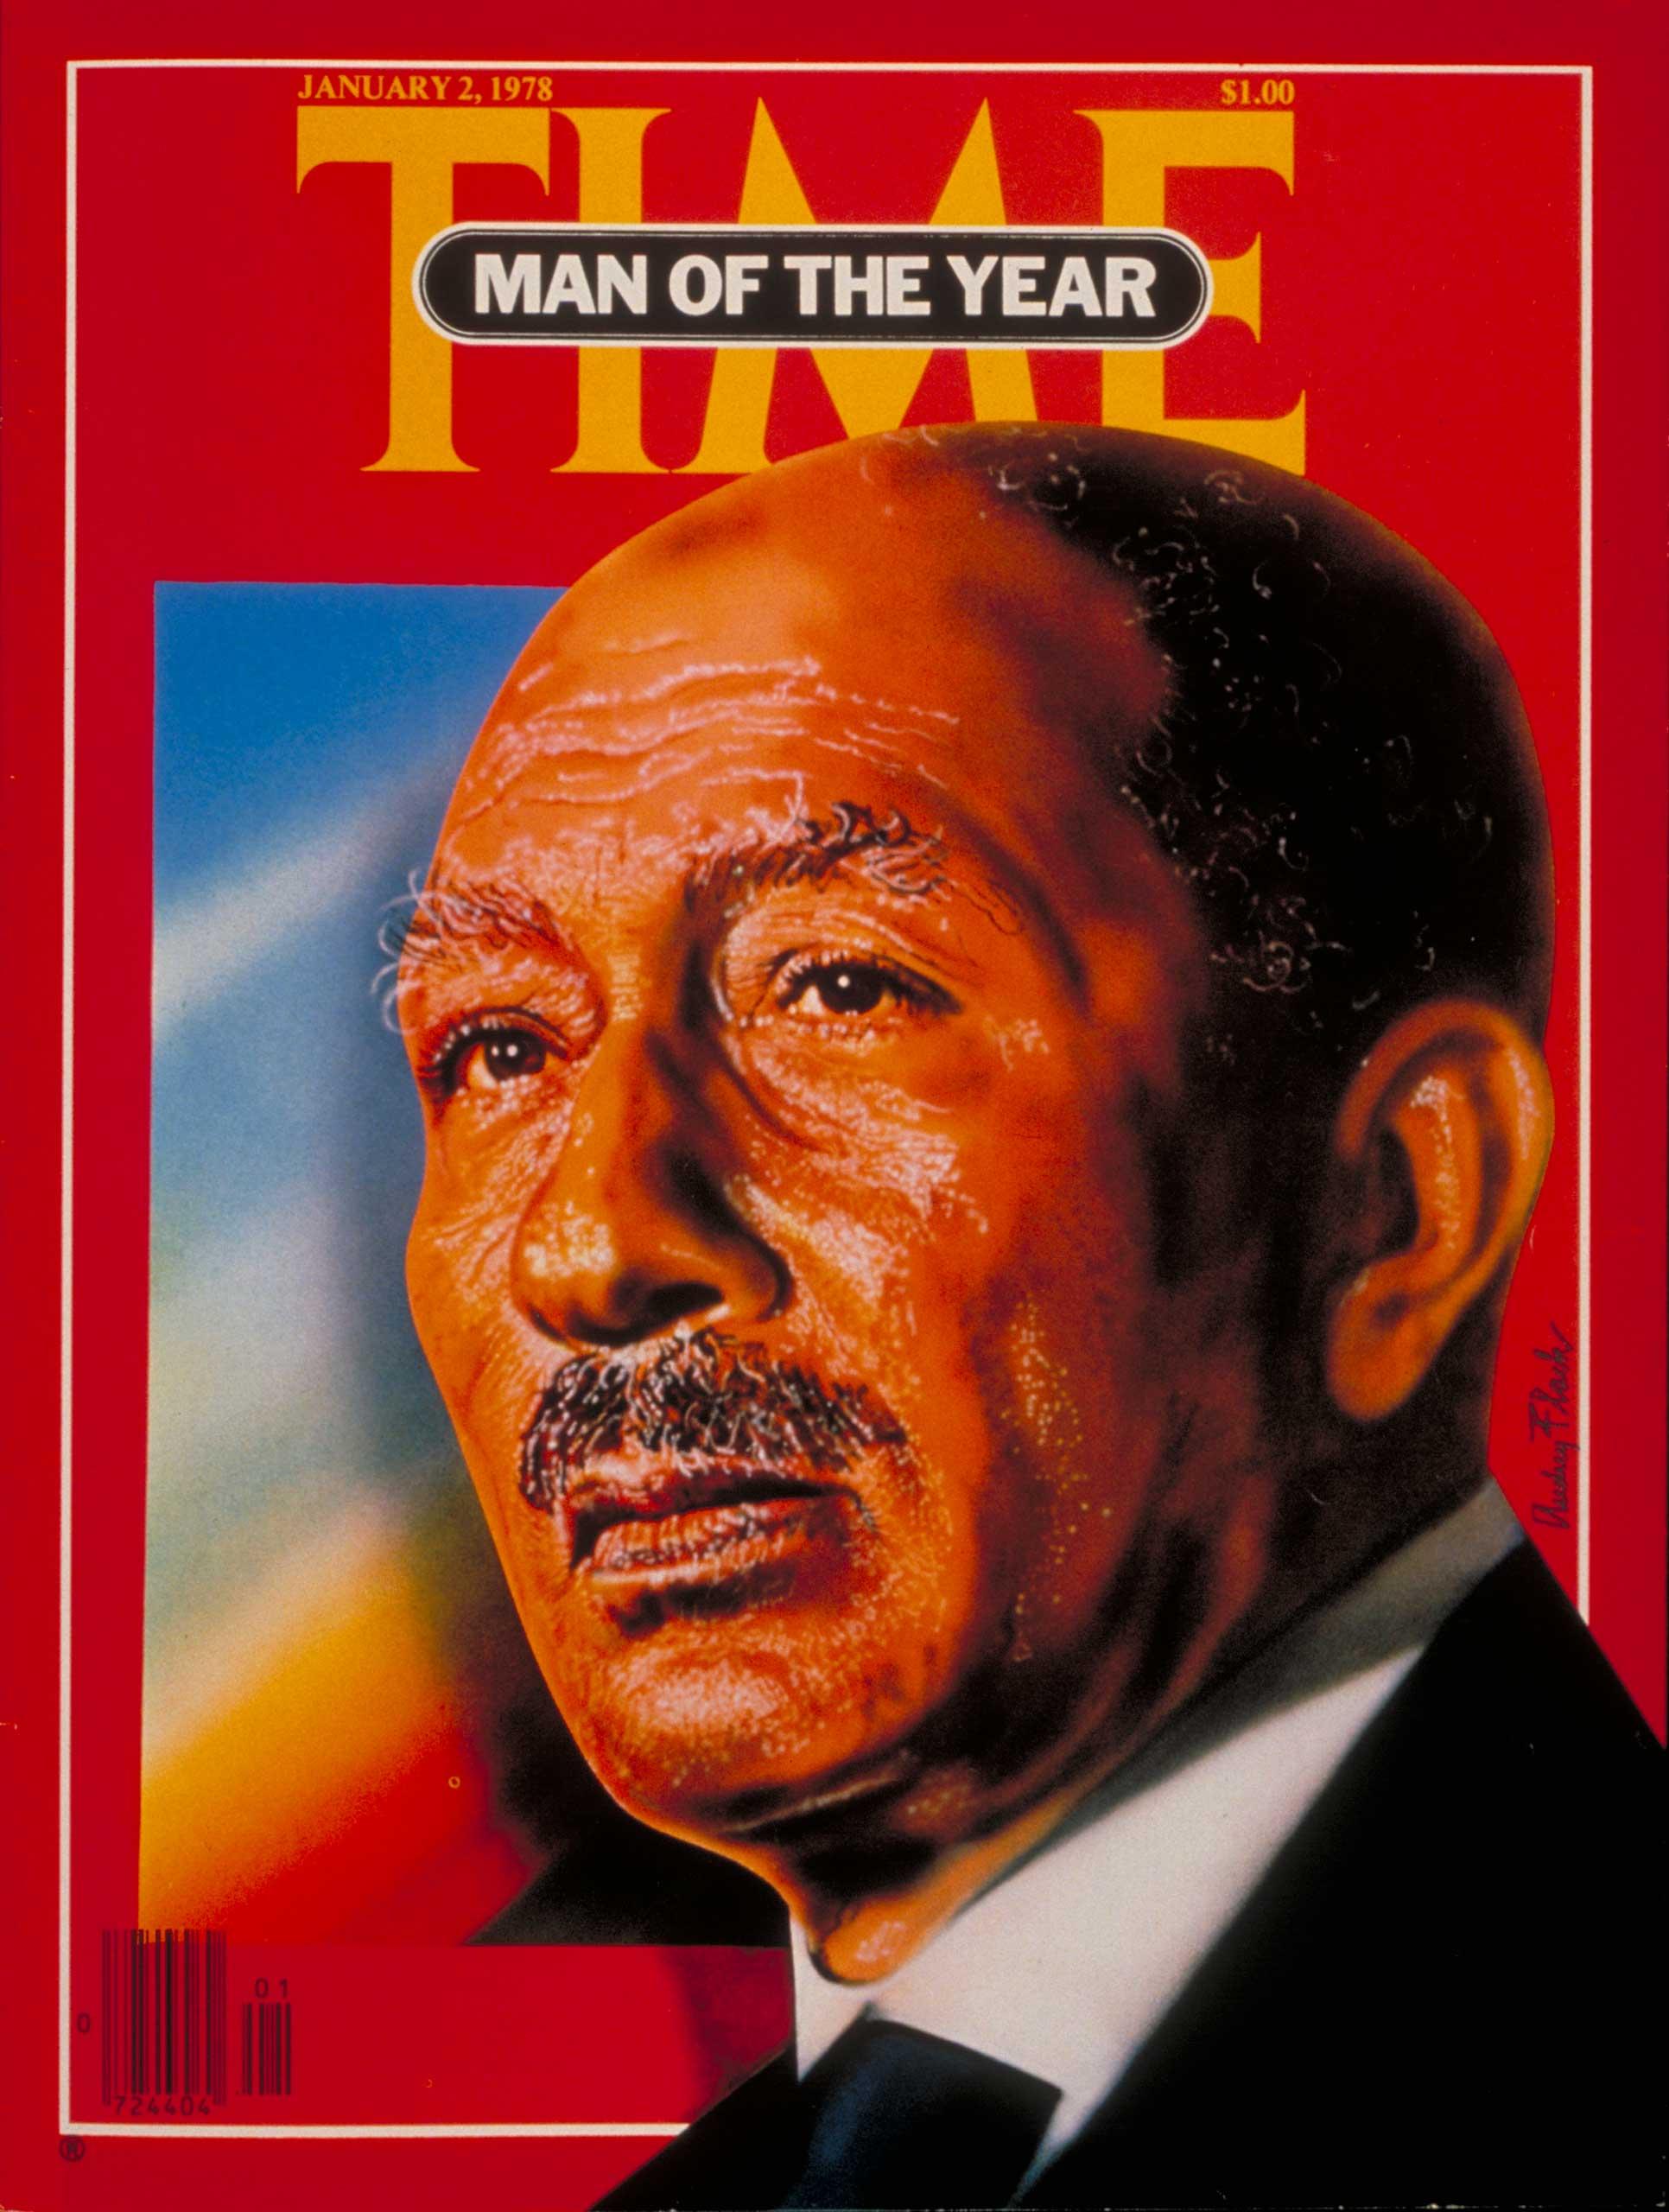 1977: Anwar Sadat